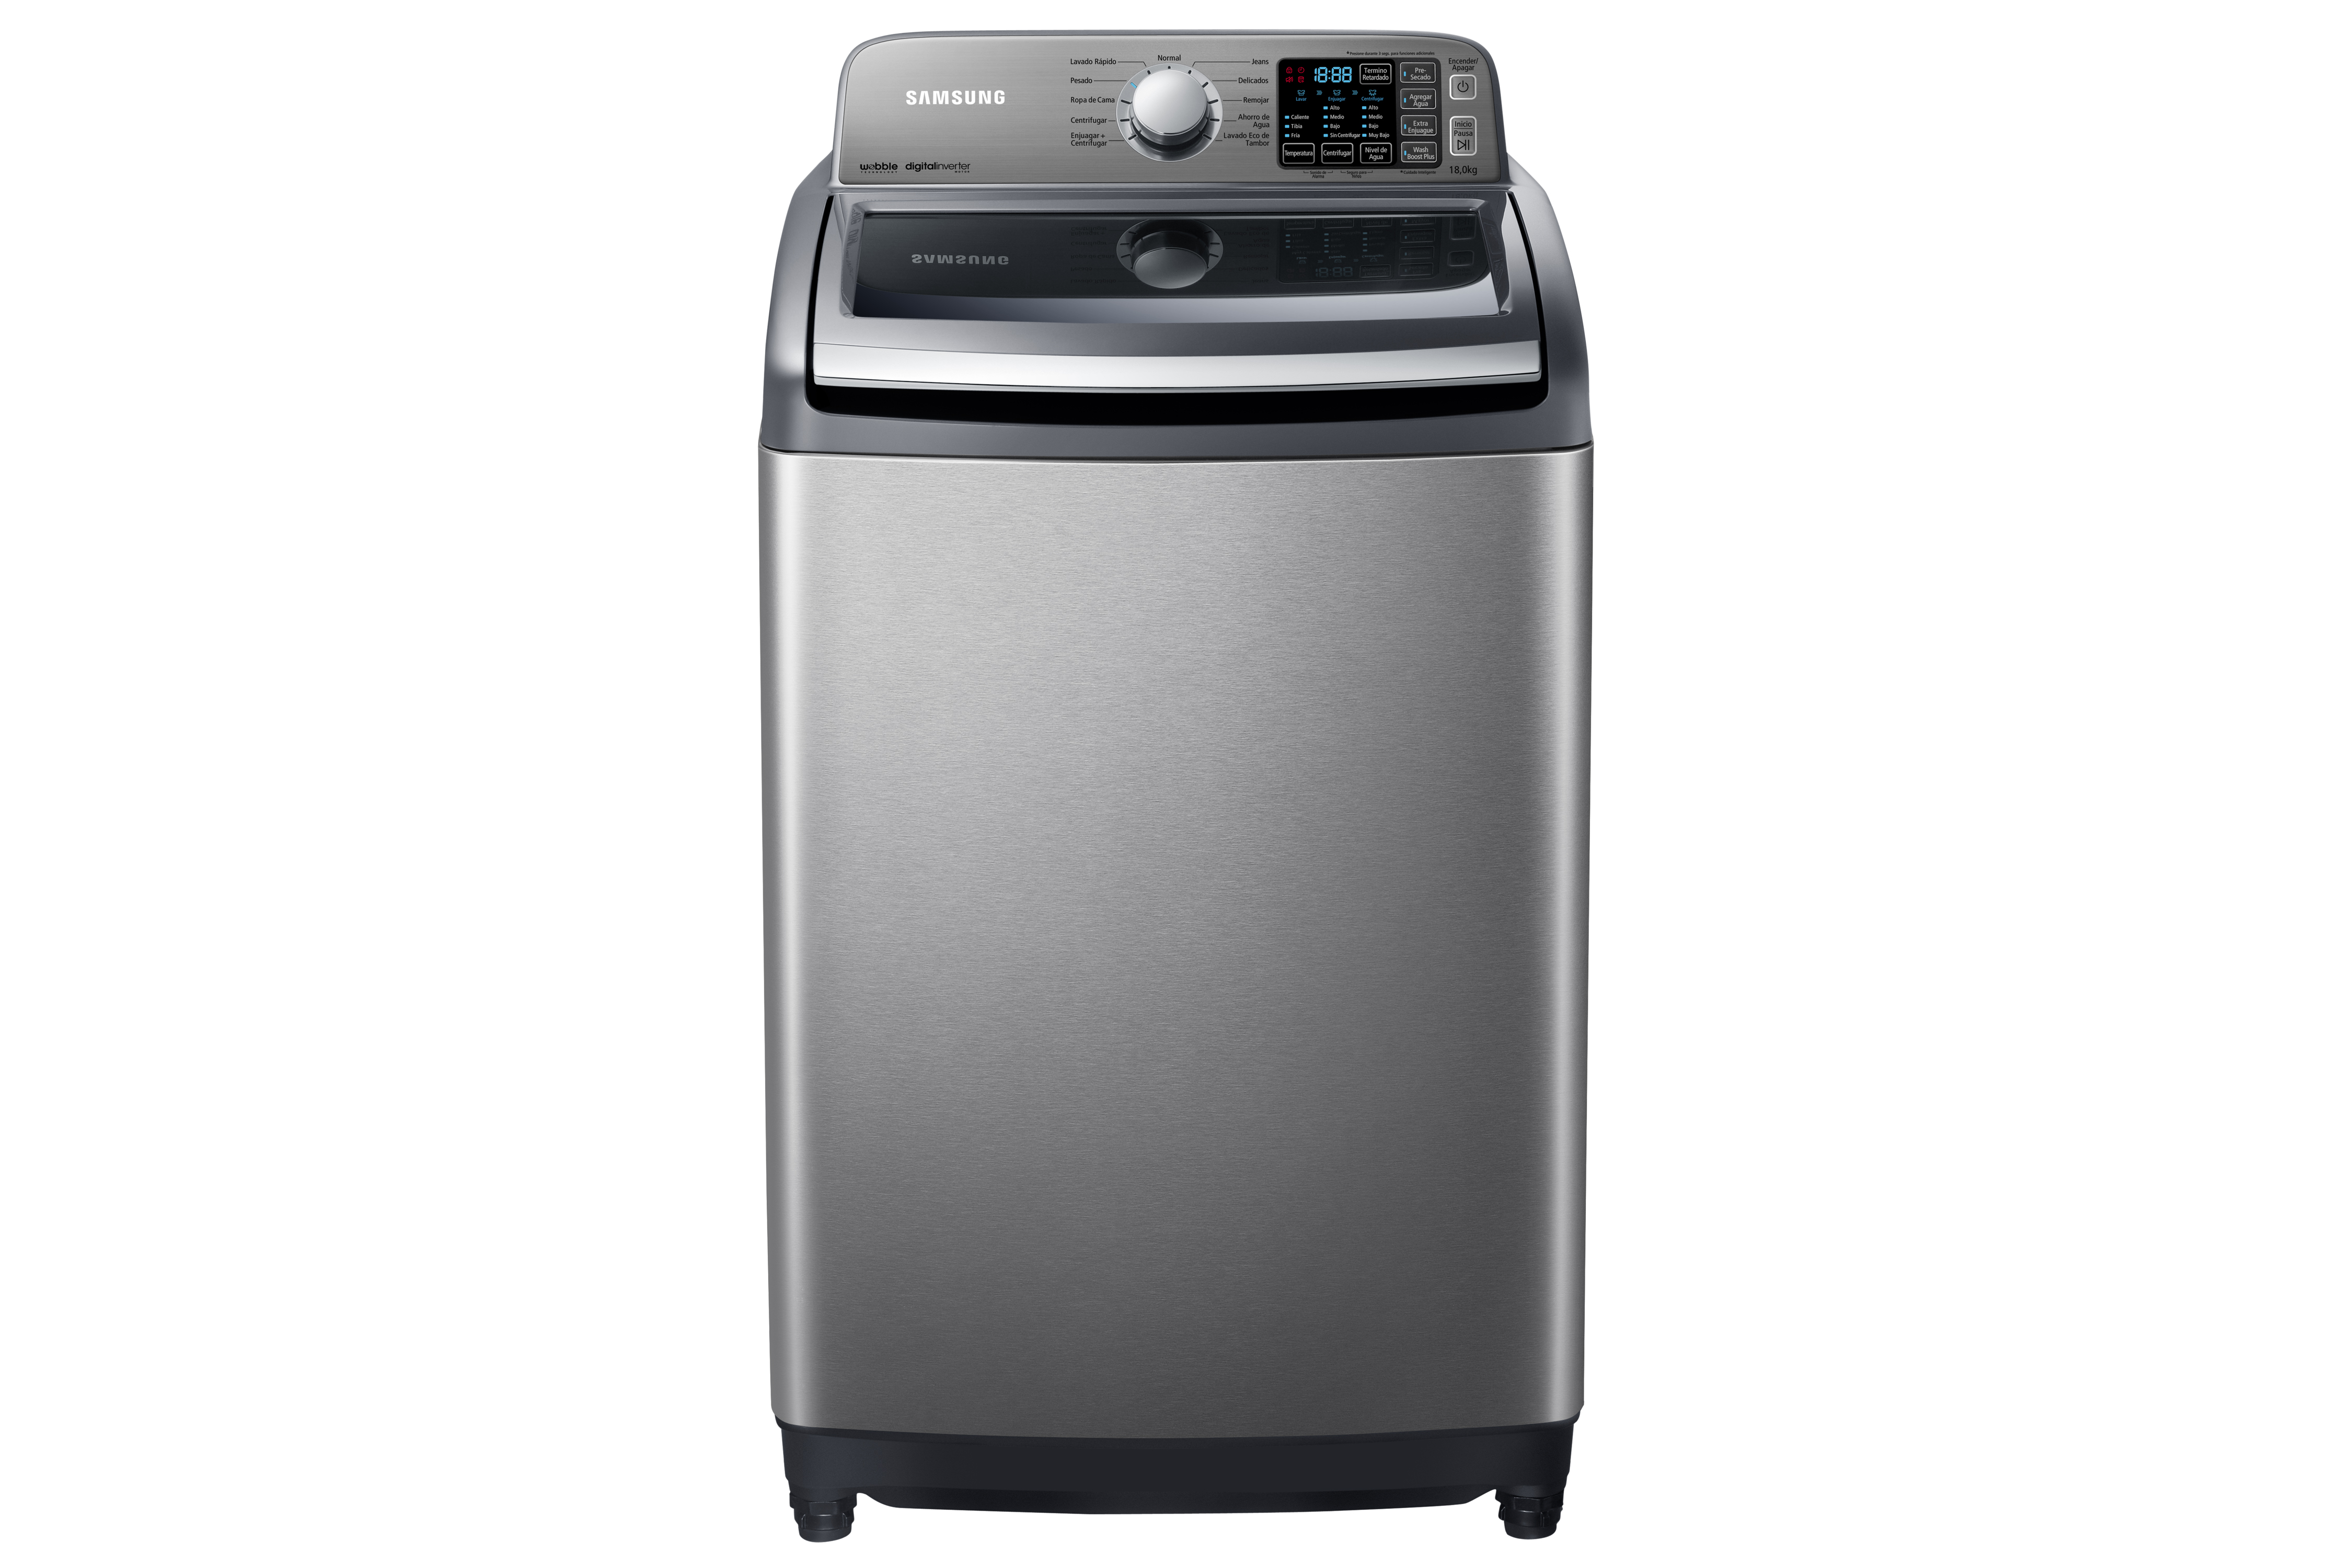 Samsung presenta la nueva l nea de lavadoras wobble - Lavadora sin agua ...